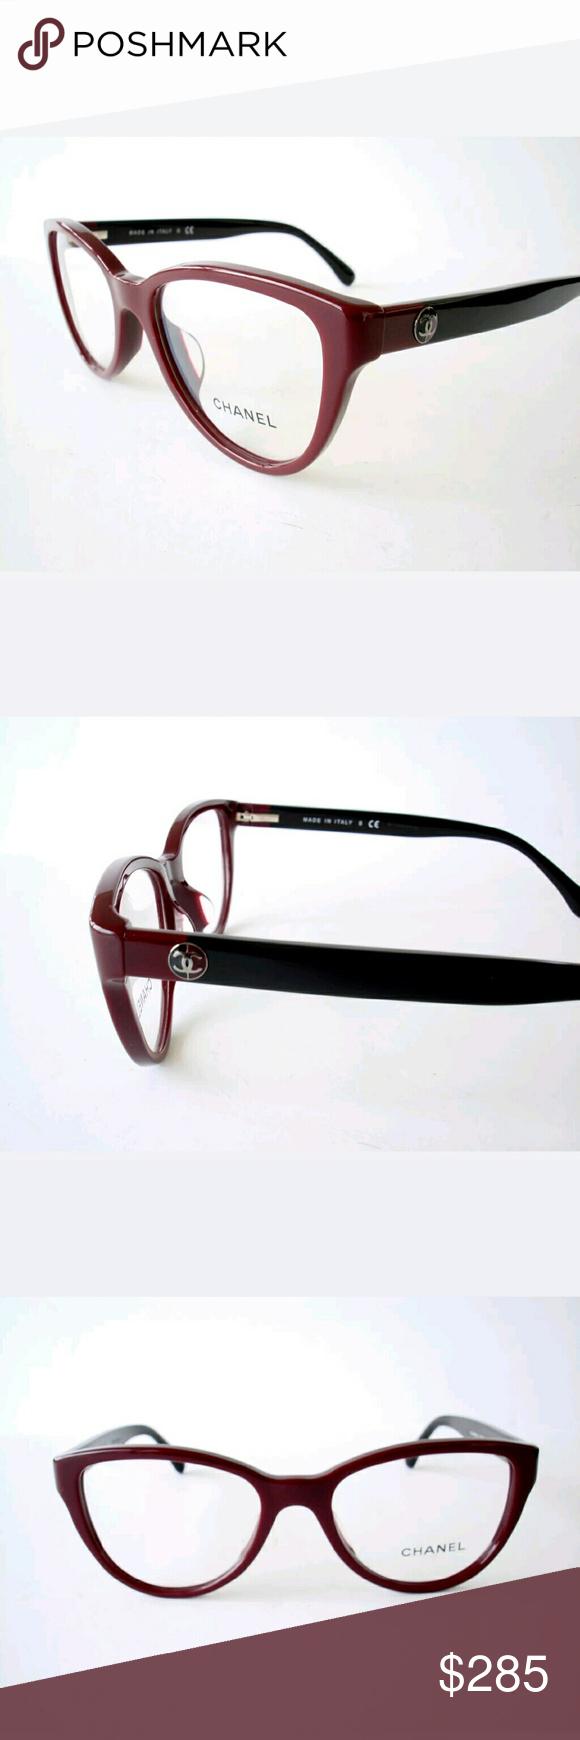 2ad7f35ac896 Selling this Chanel Eyeglasses on Poshmark! My username is  shoney66.   shopmycloset  poshmark  fashion  shopping  style  forsale  CHANEL   Accessories